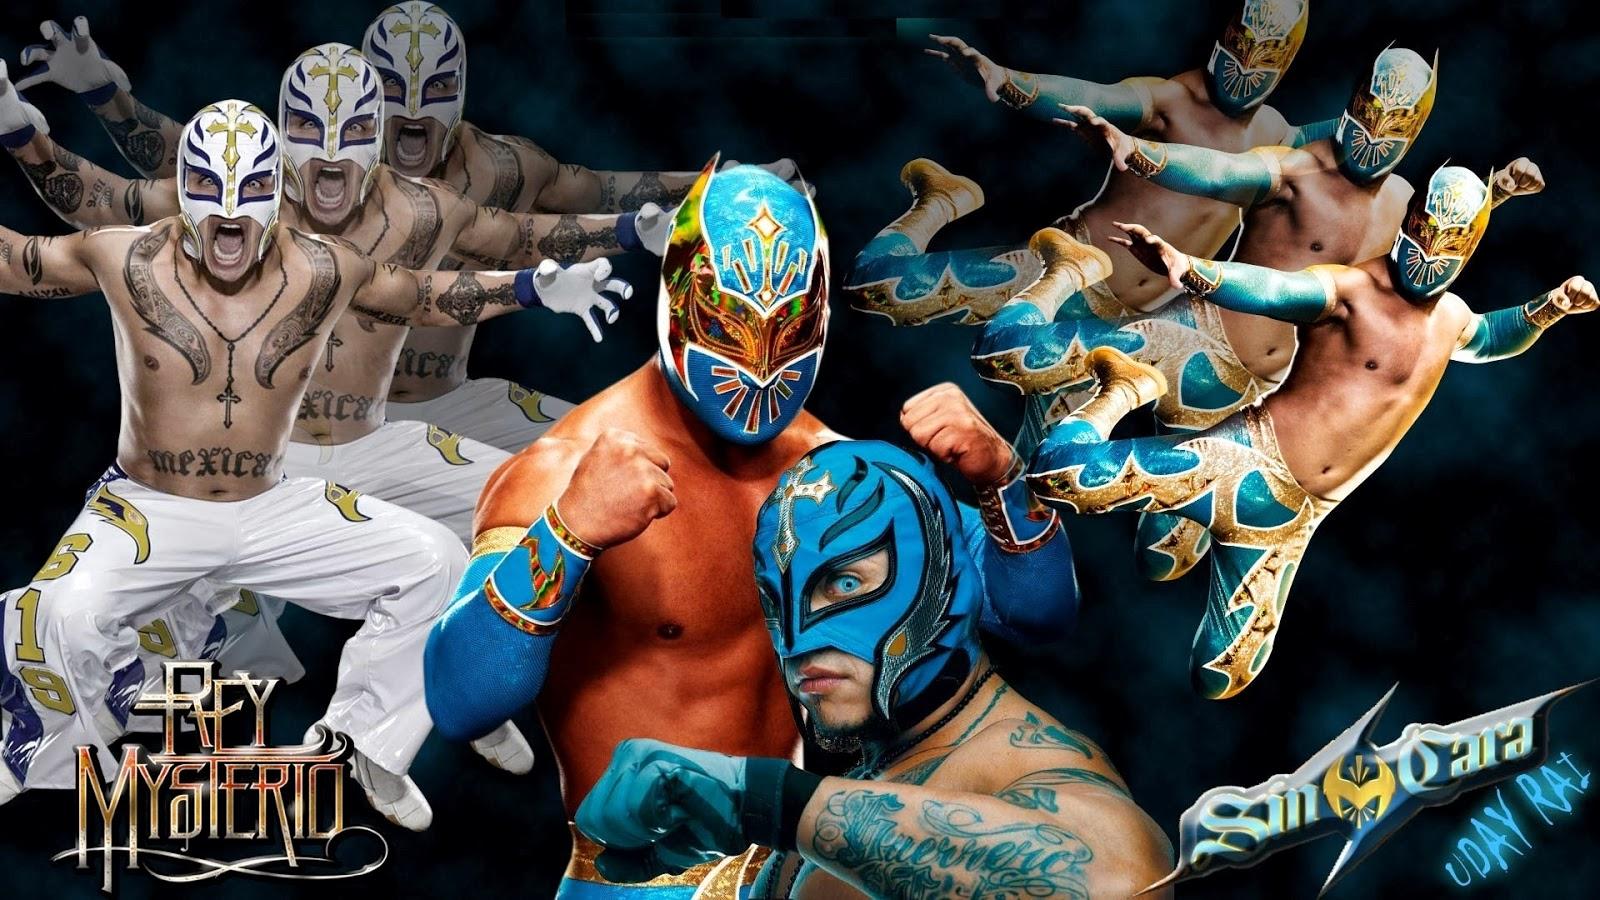 Wwe rey mysterio hd wallpapers wwe wrestling wallpapers - Wwe 619 images ...